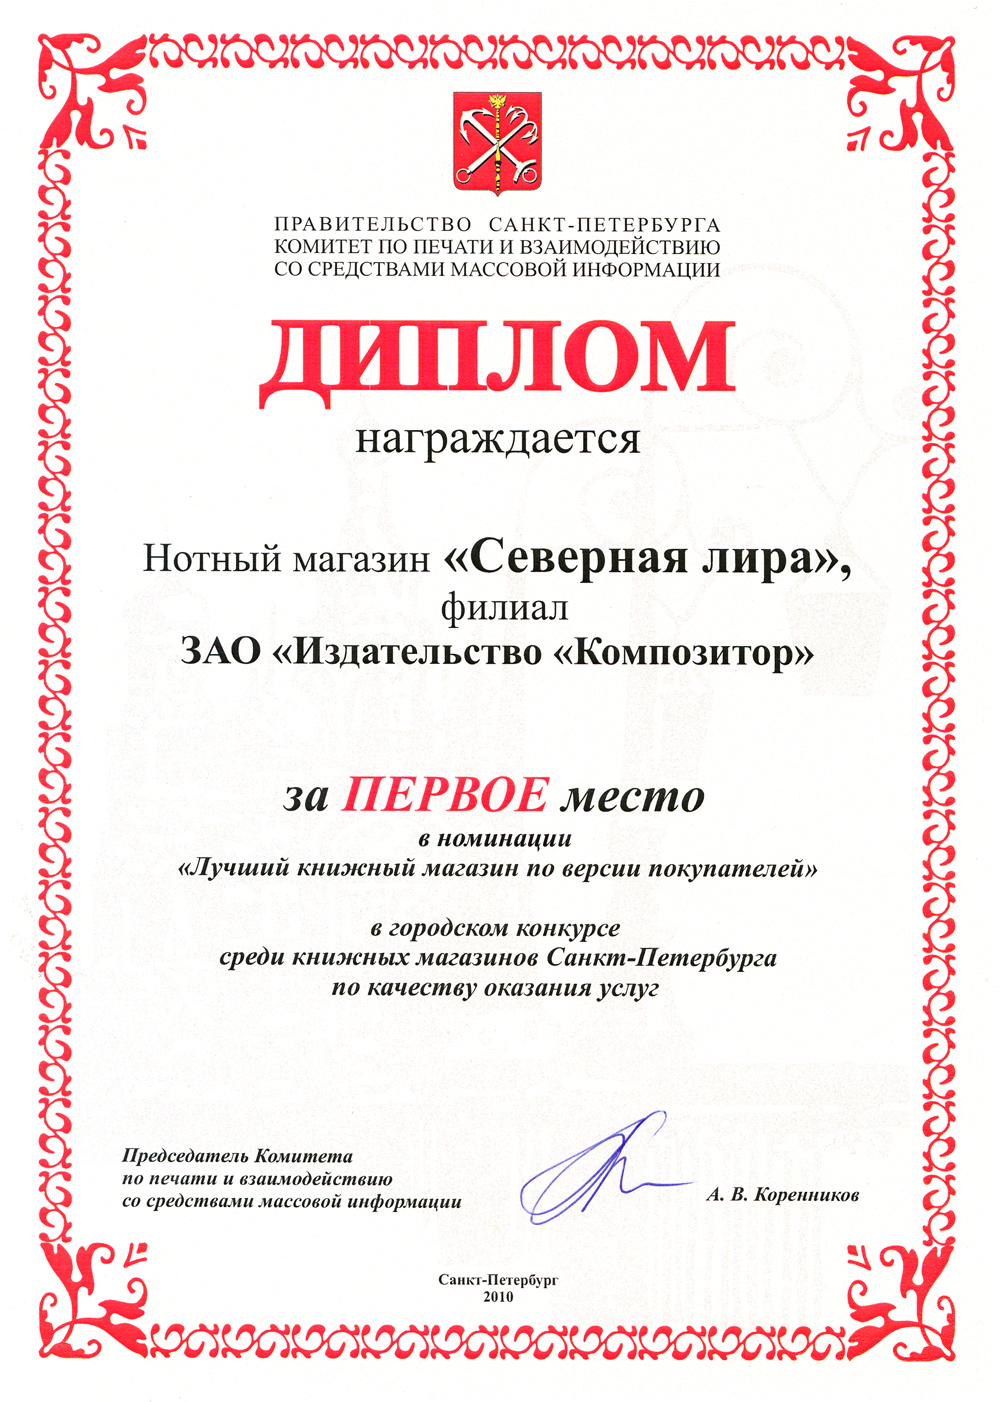 Номинации конкурса для продавцов